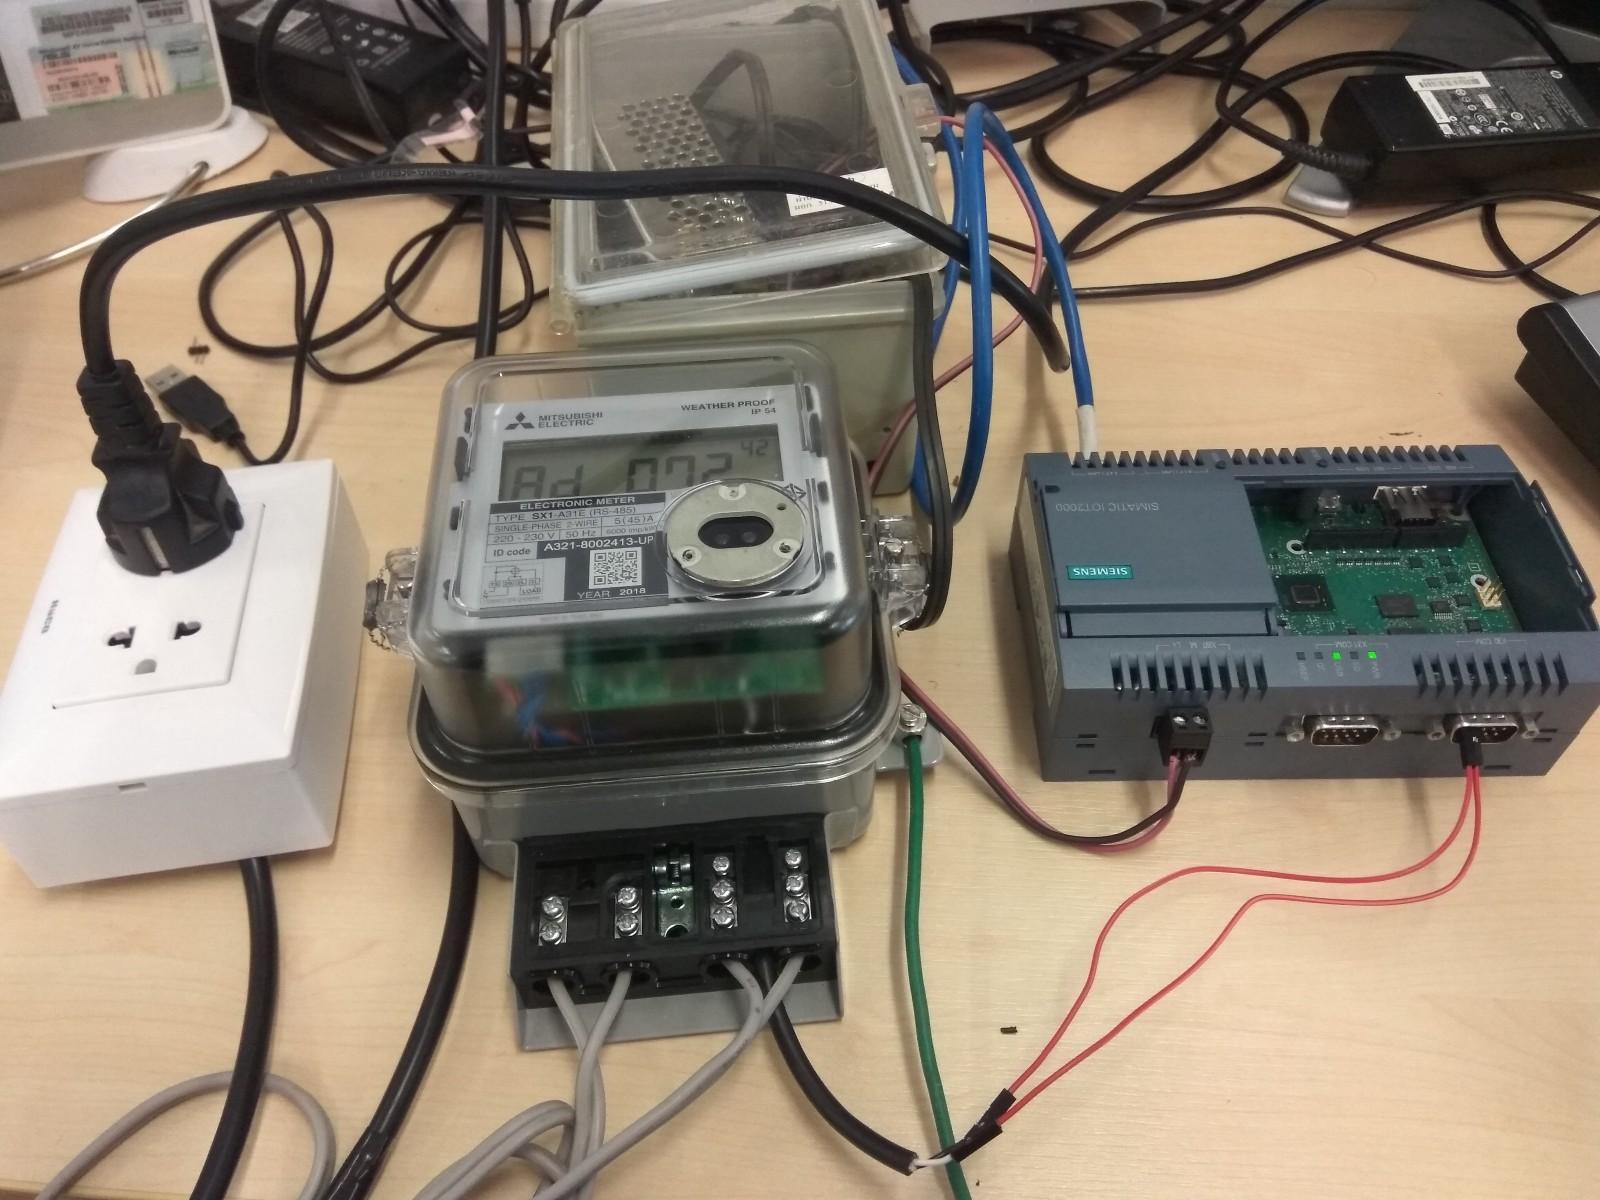 Connecting Modbus RTU Smart Energy Meter and Siemens Simatic IoT2040